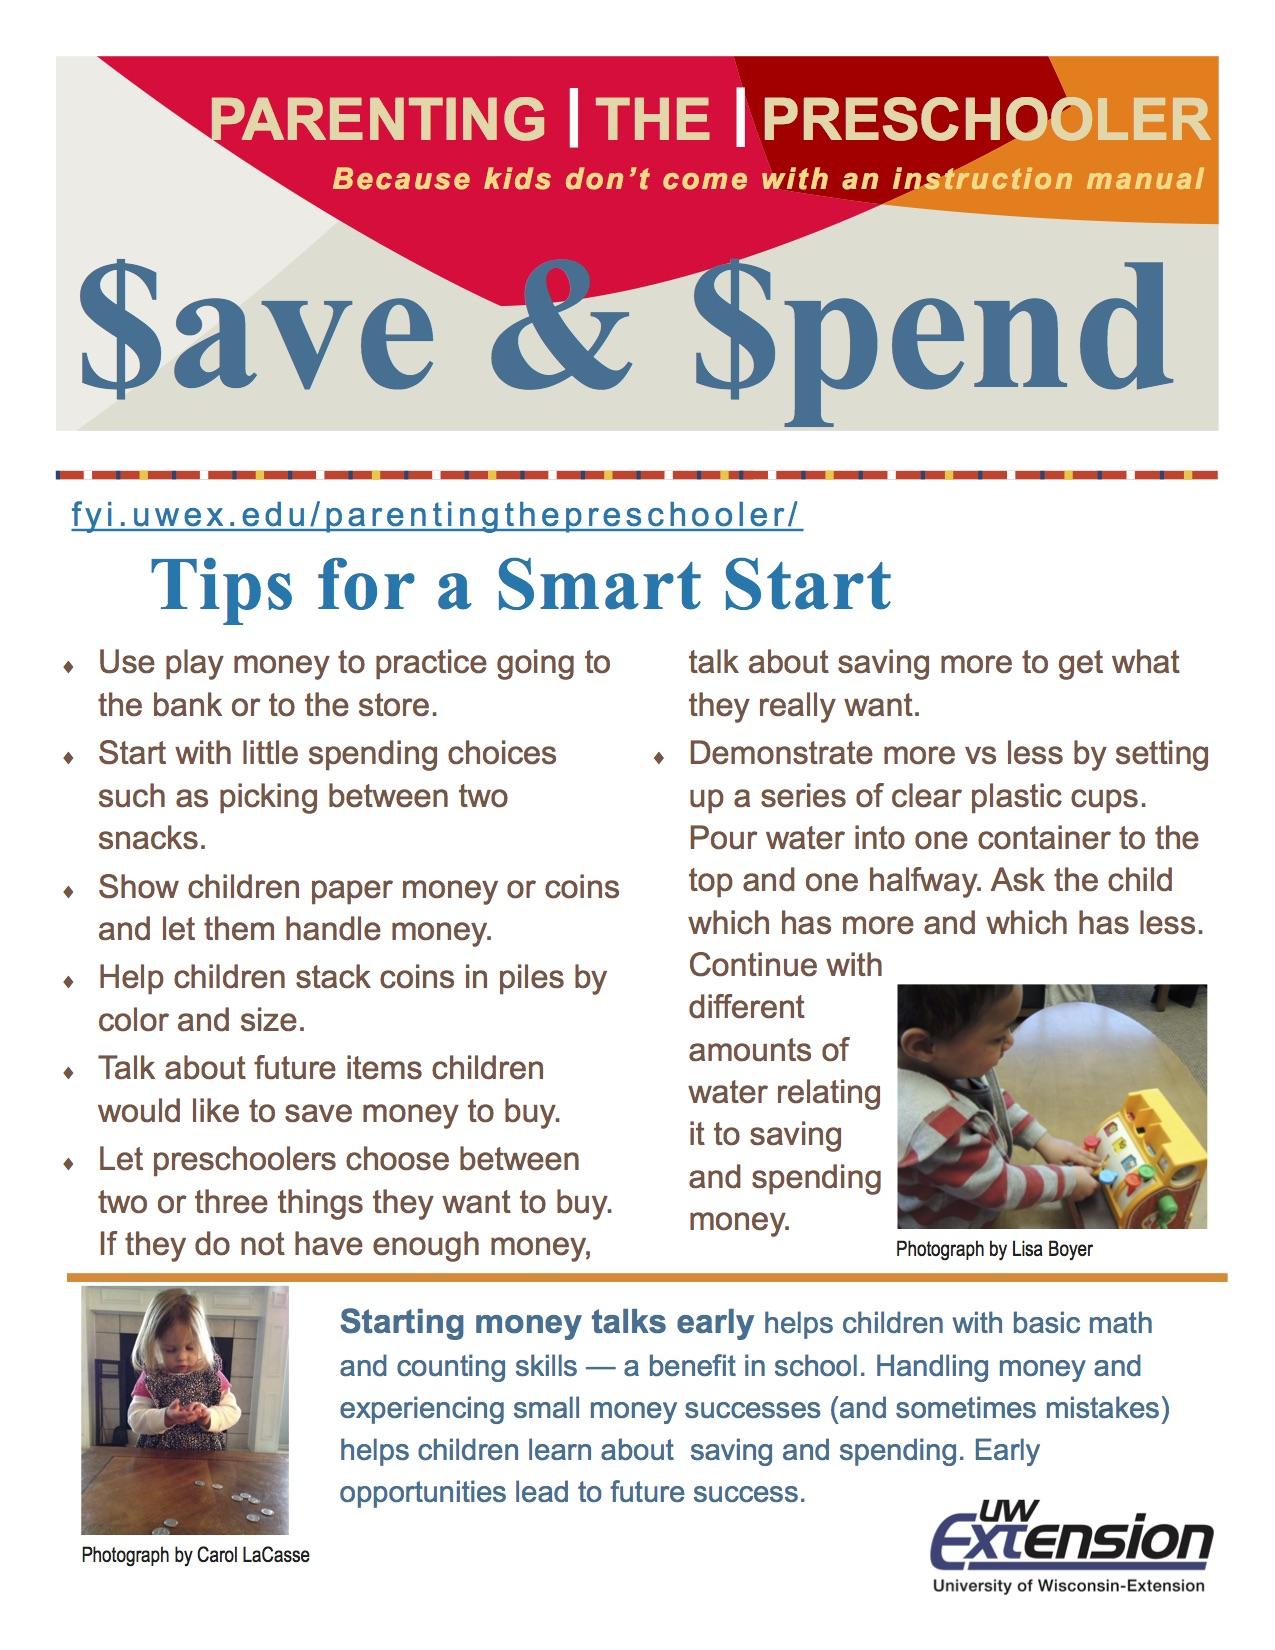 PtP-Save-Spend-State